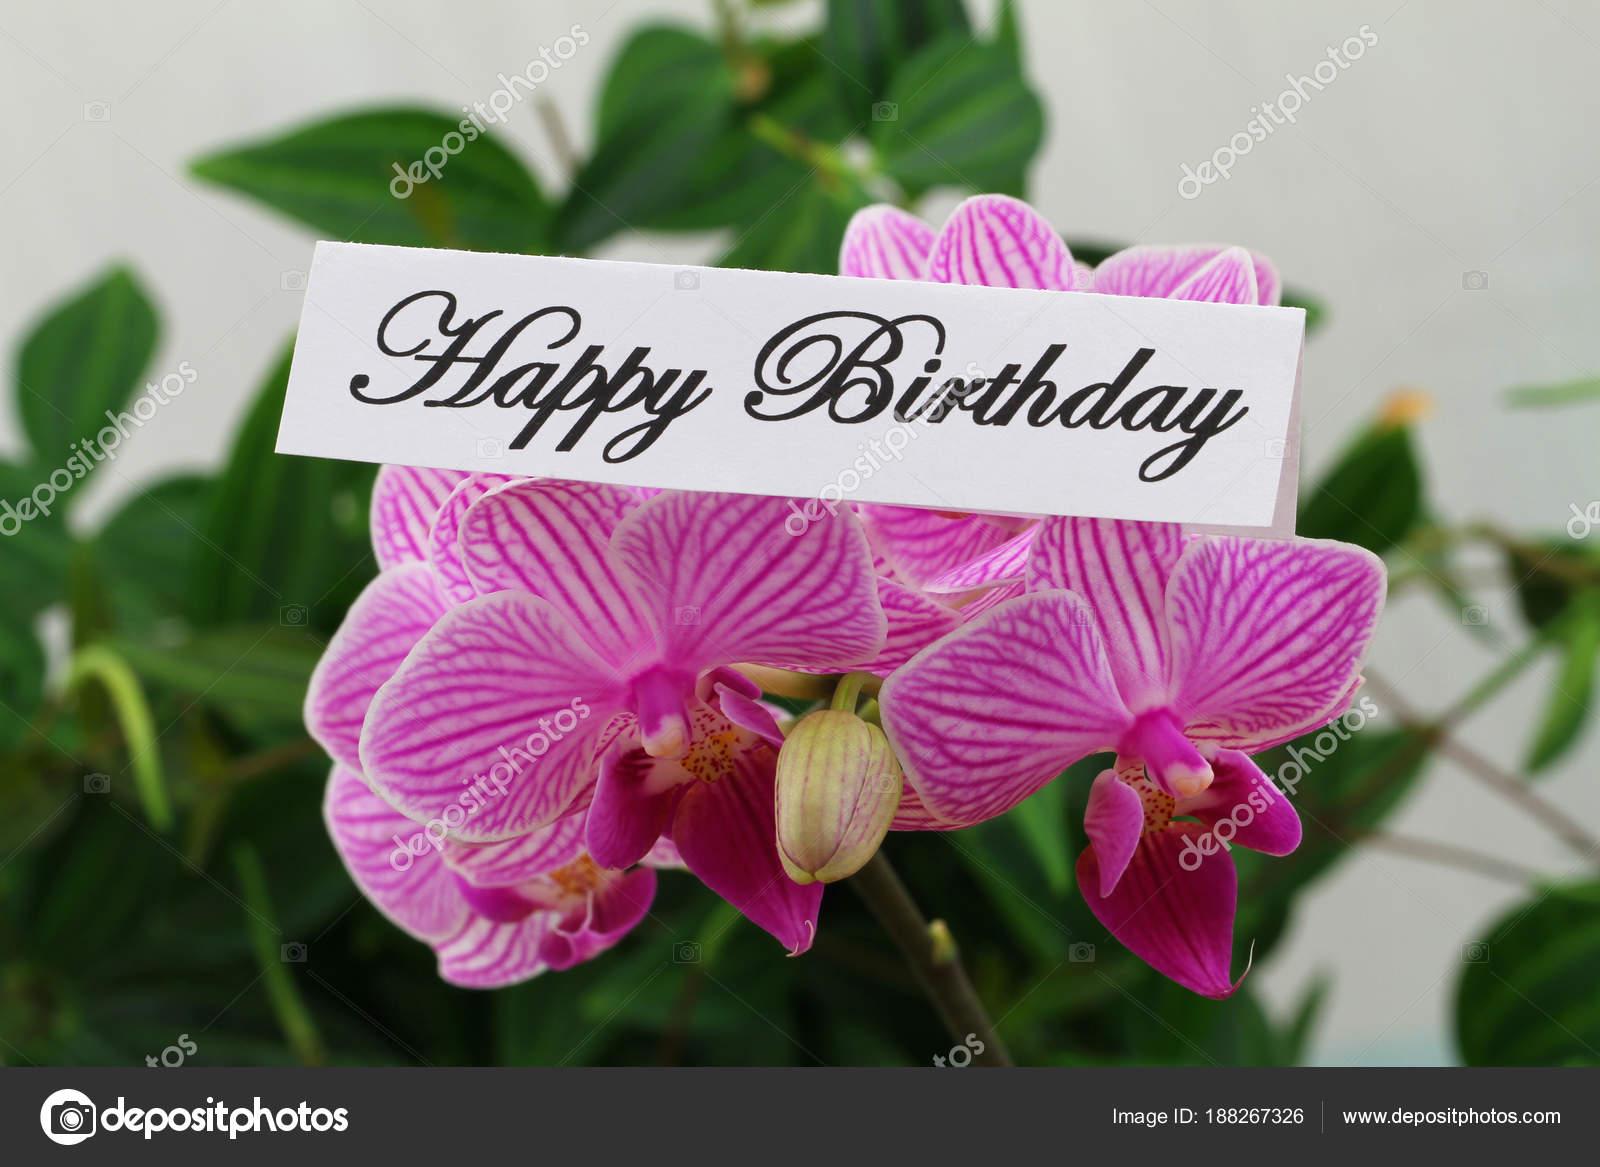 Happy birthday card pink orchid stock photo graletta 188267326 happy birthday card pink orchid stock photo izmirmasajfo